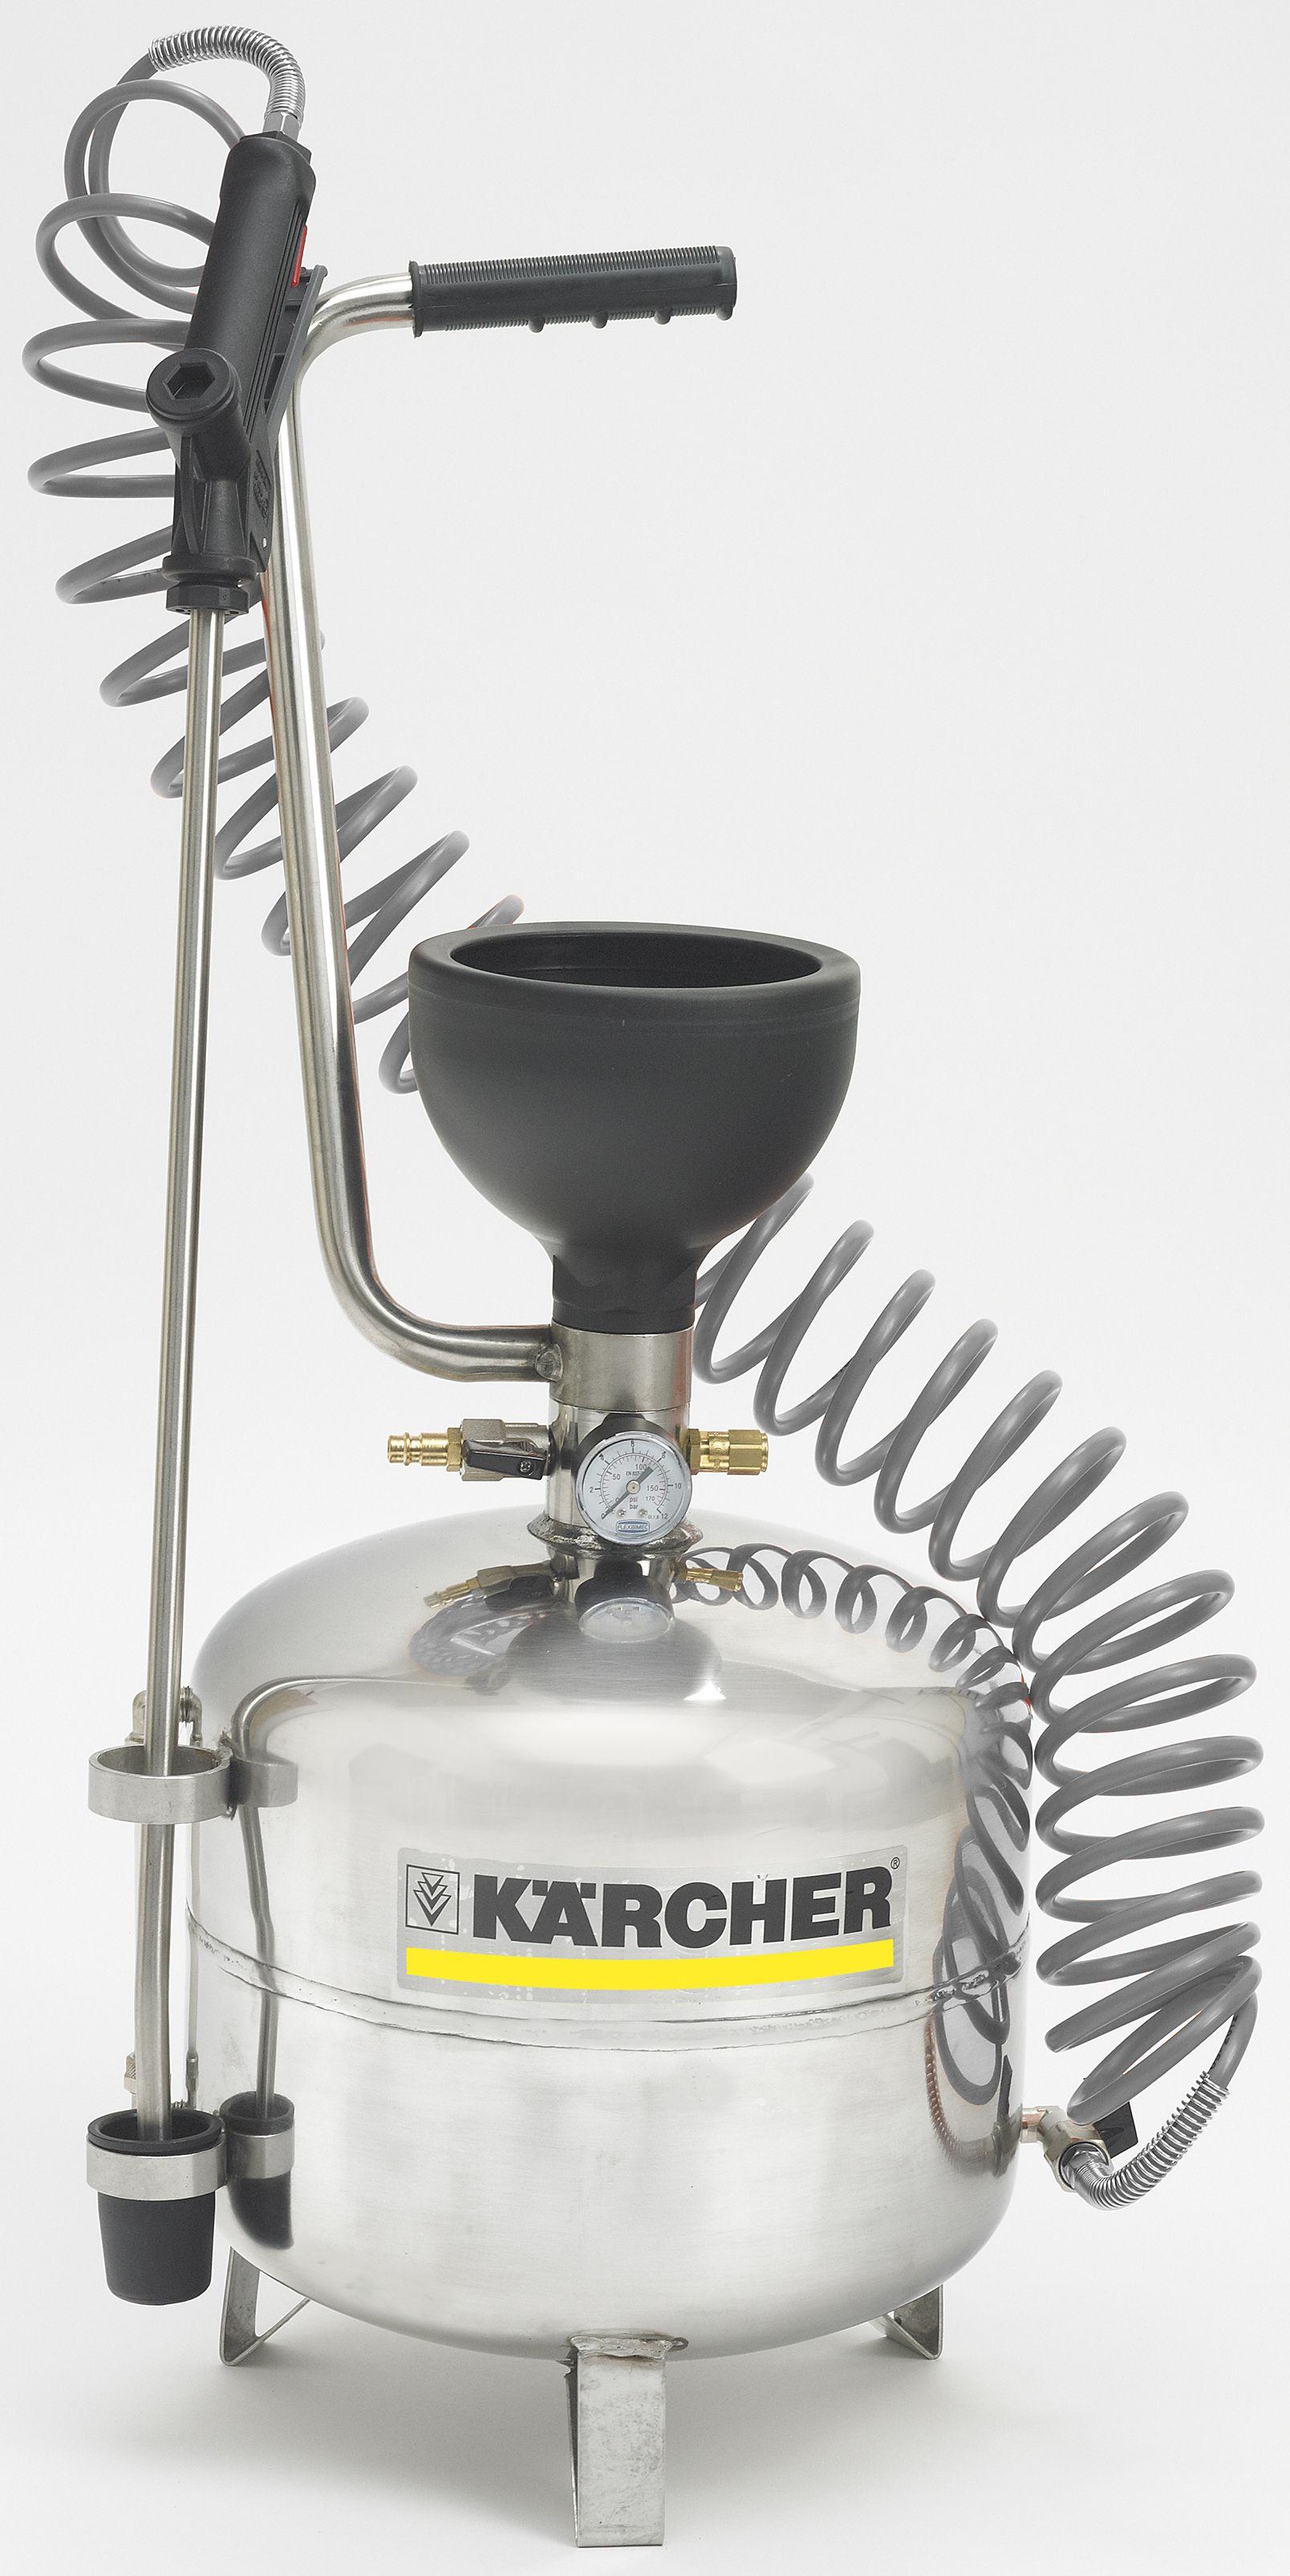 Kärcher Kjemisprøyte bærbar rustfri 16L 9.549-959.0